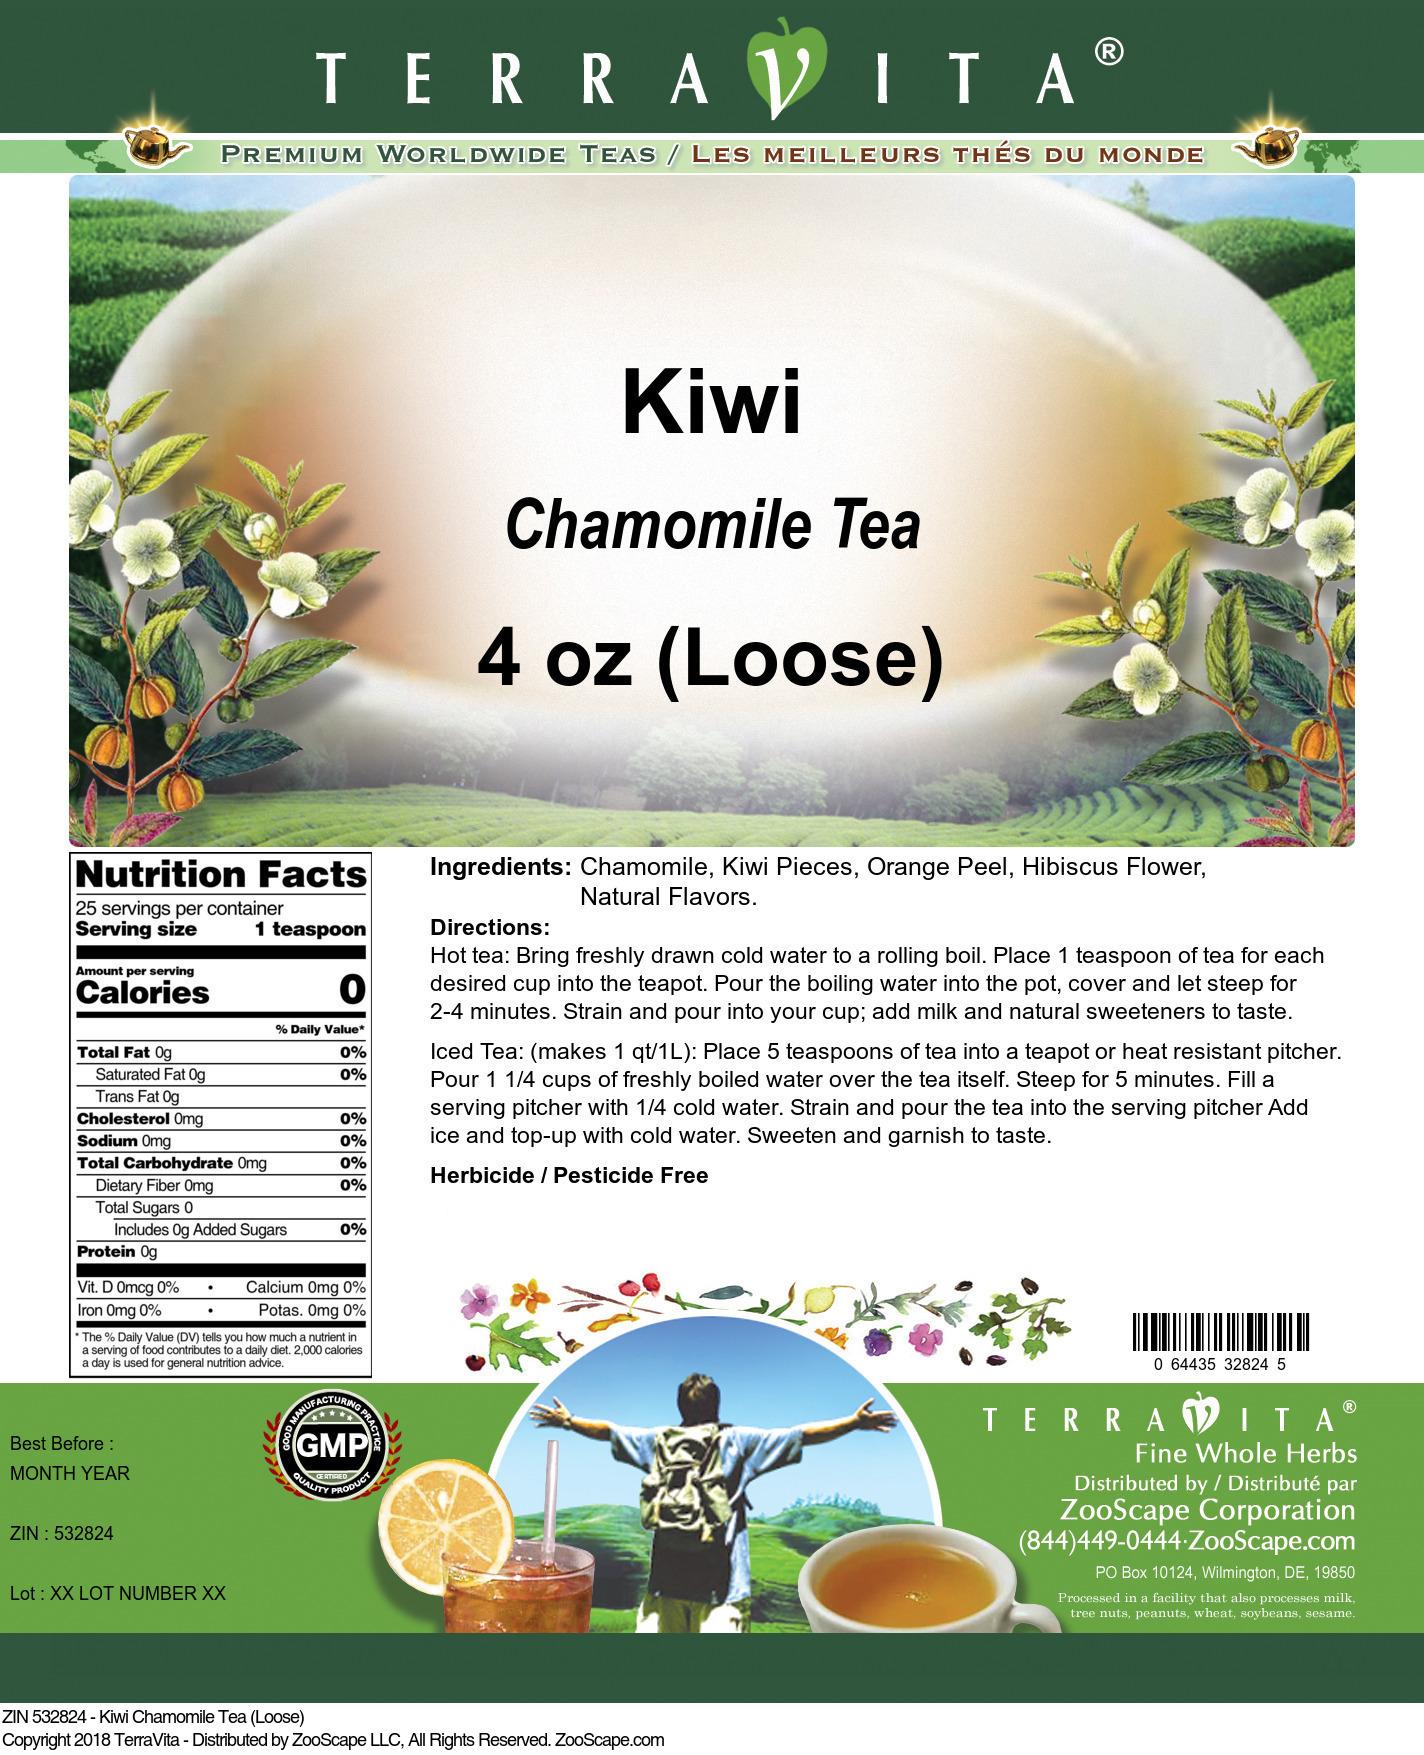 Kiwi Chamomile Tea (Loose)